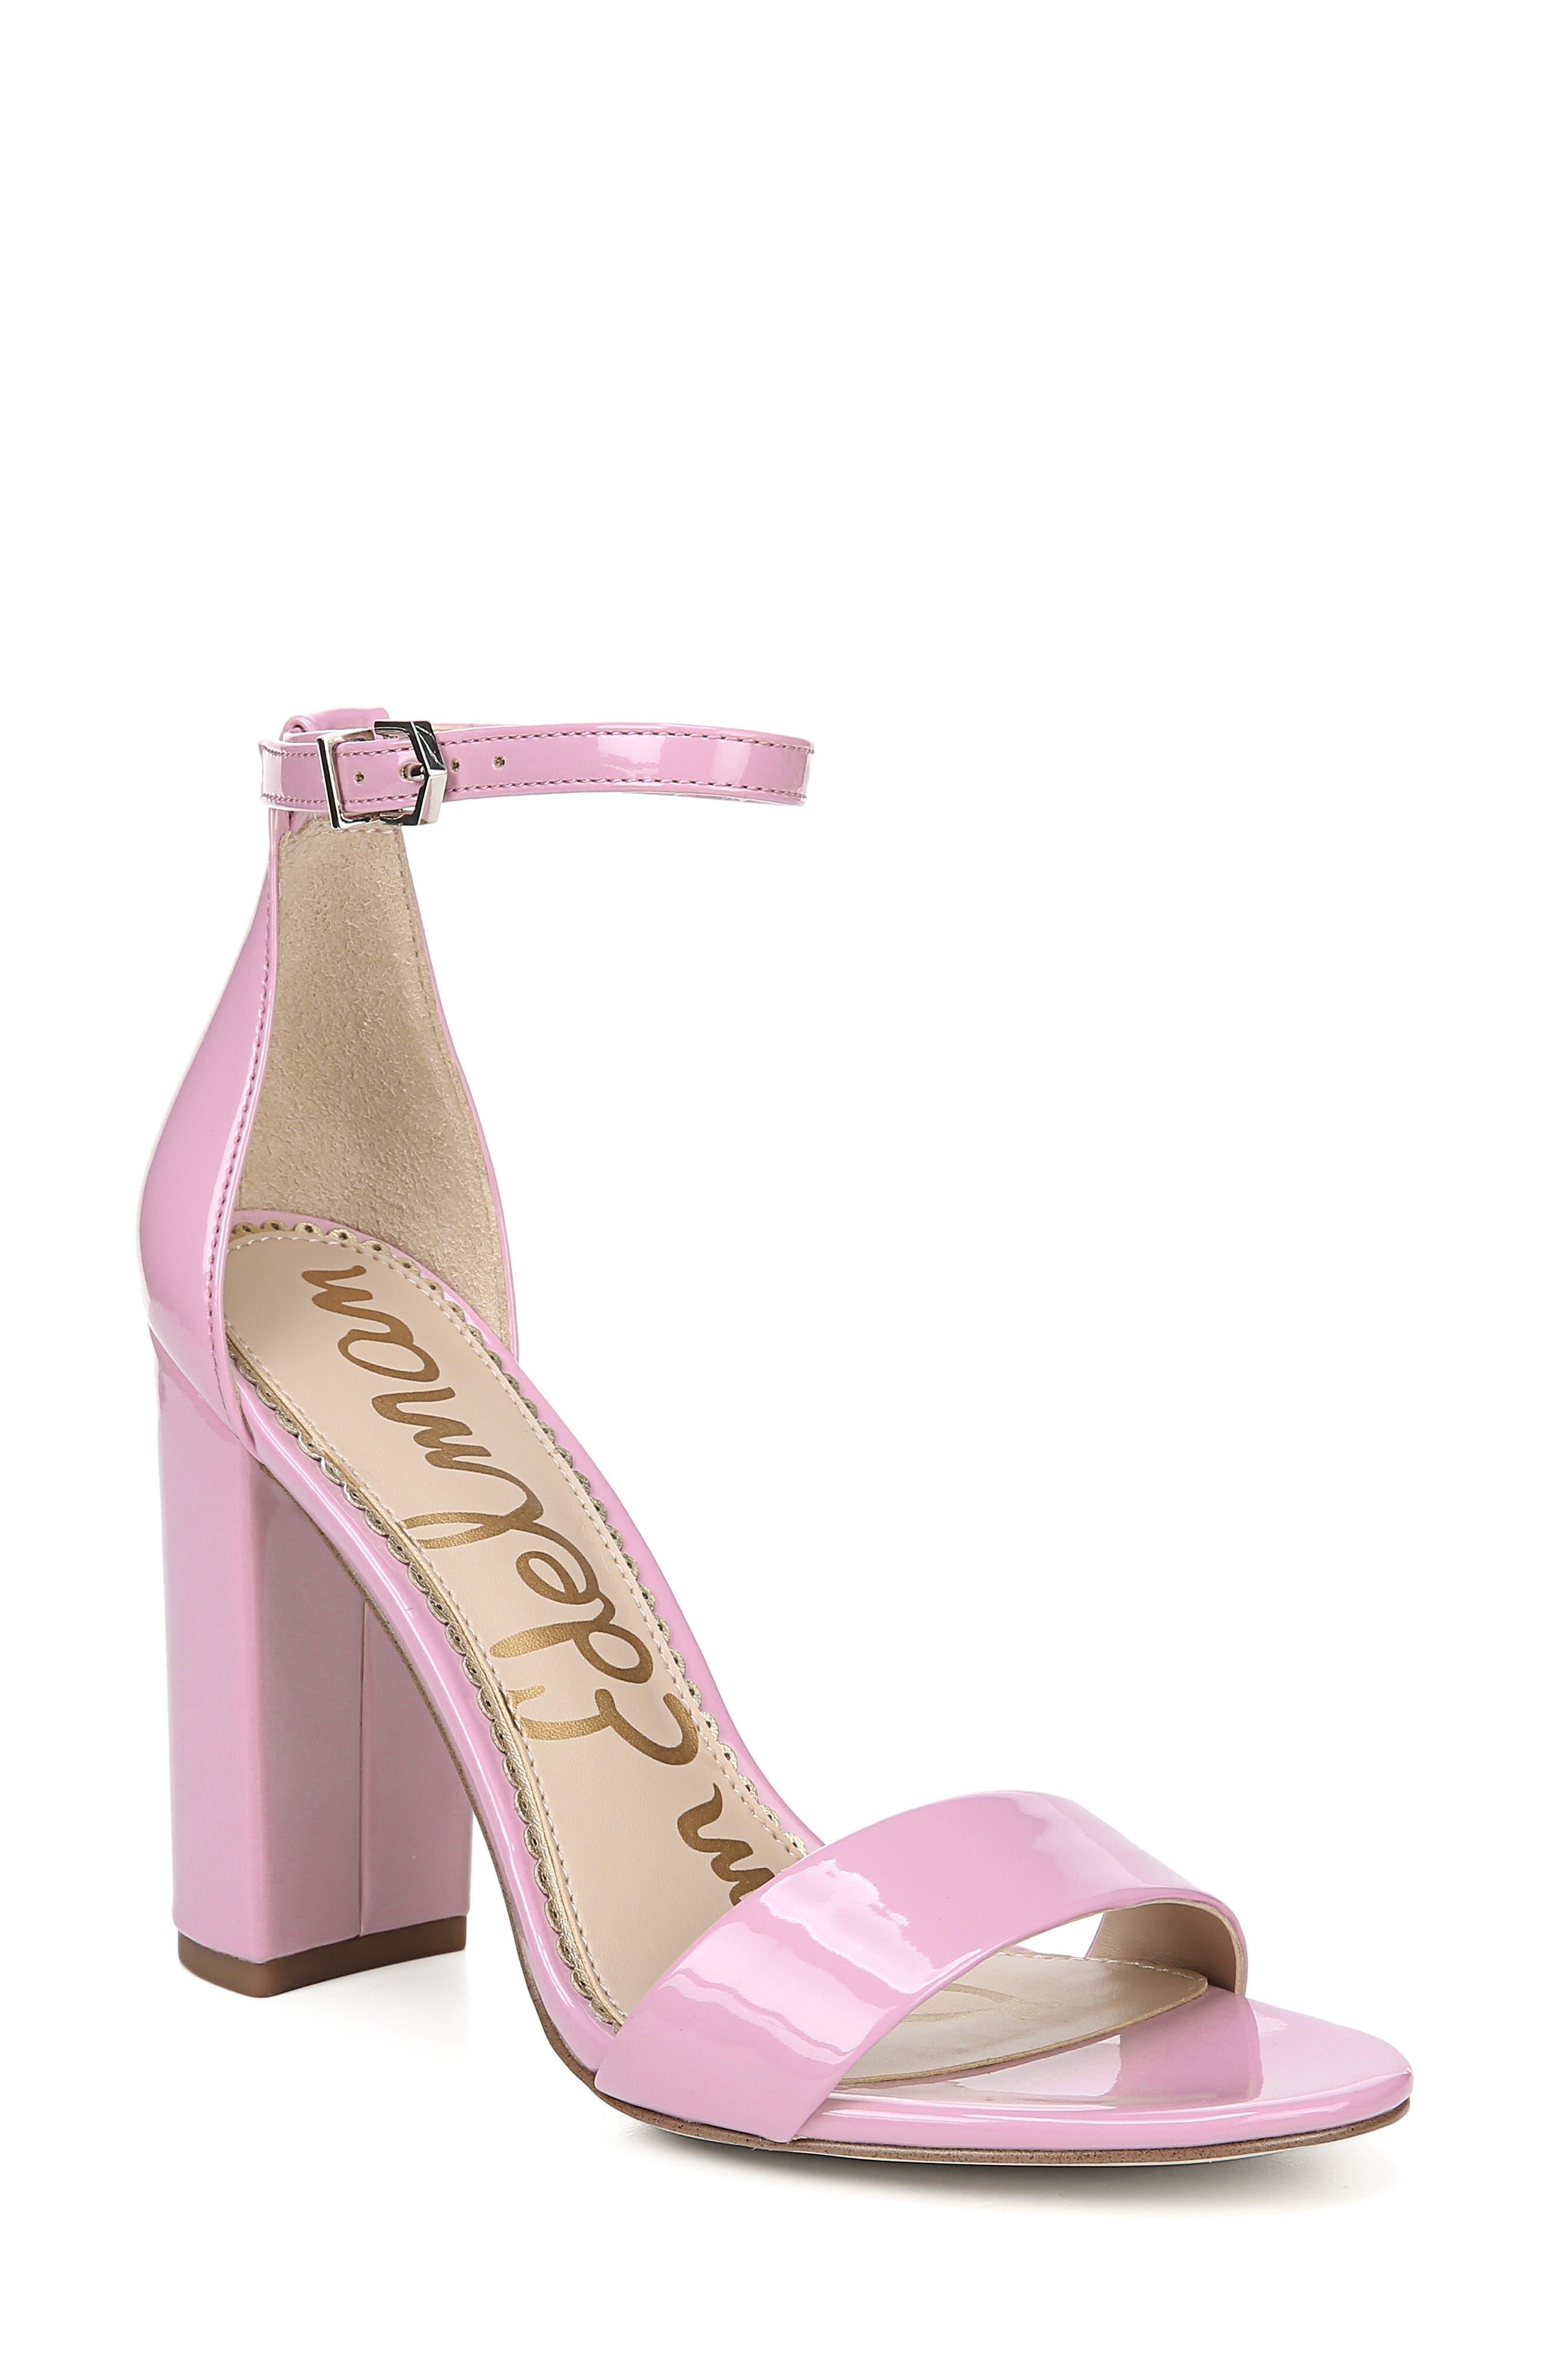 29971fa829d Sam Edelman Block-Heel Sandals for Women